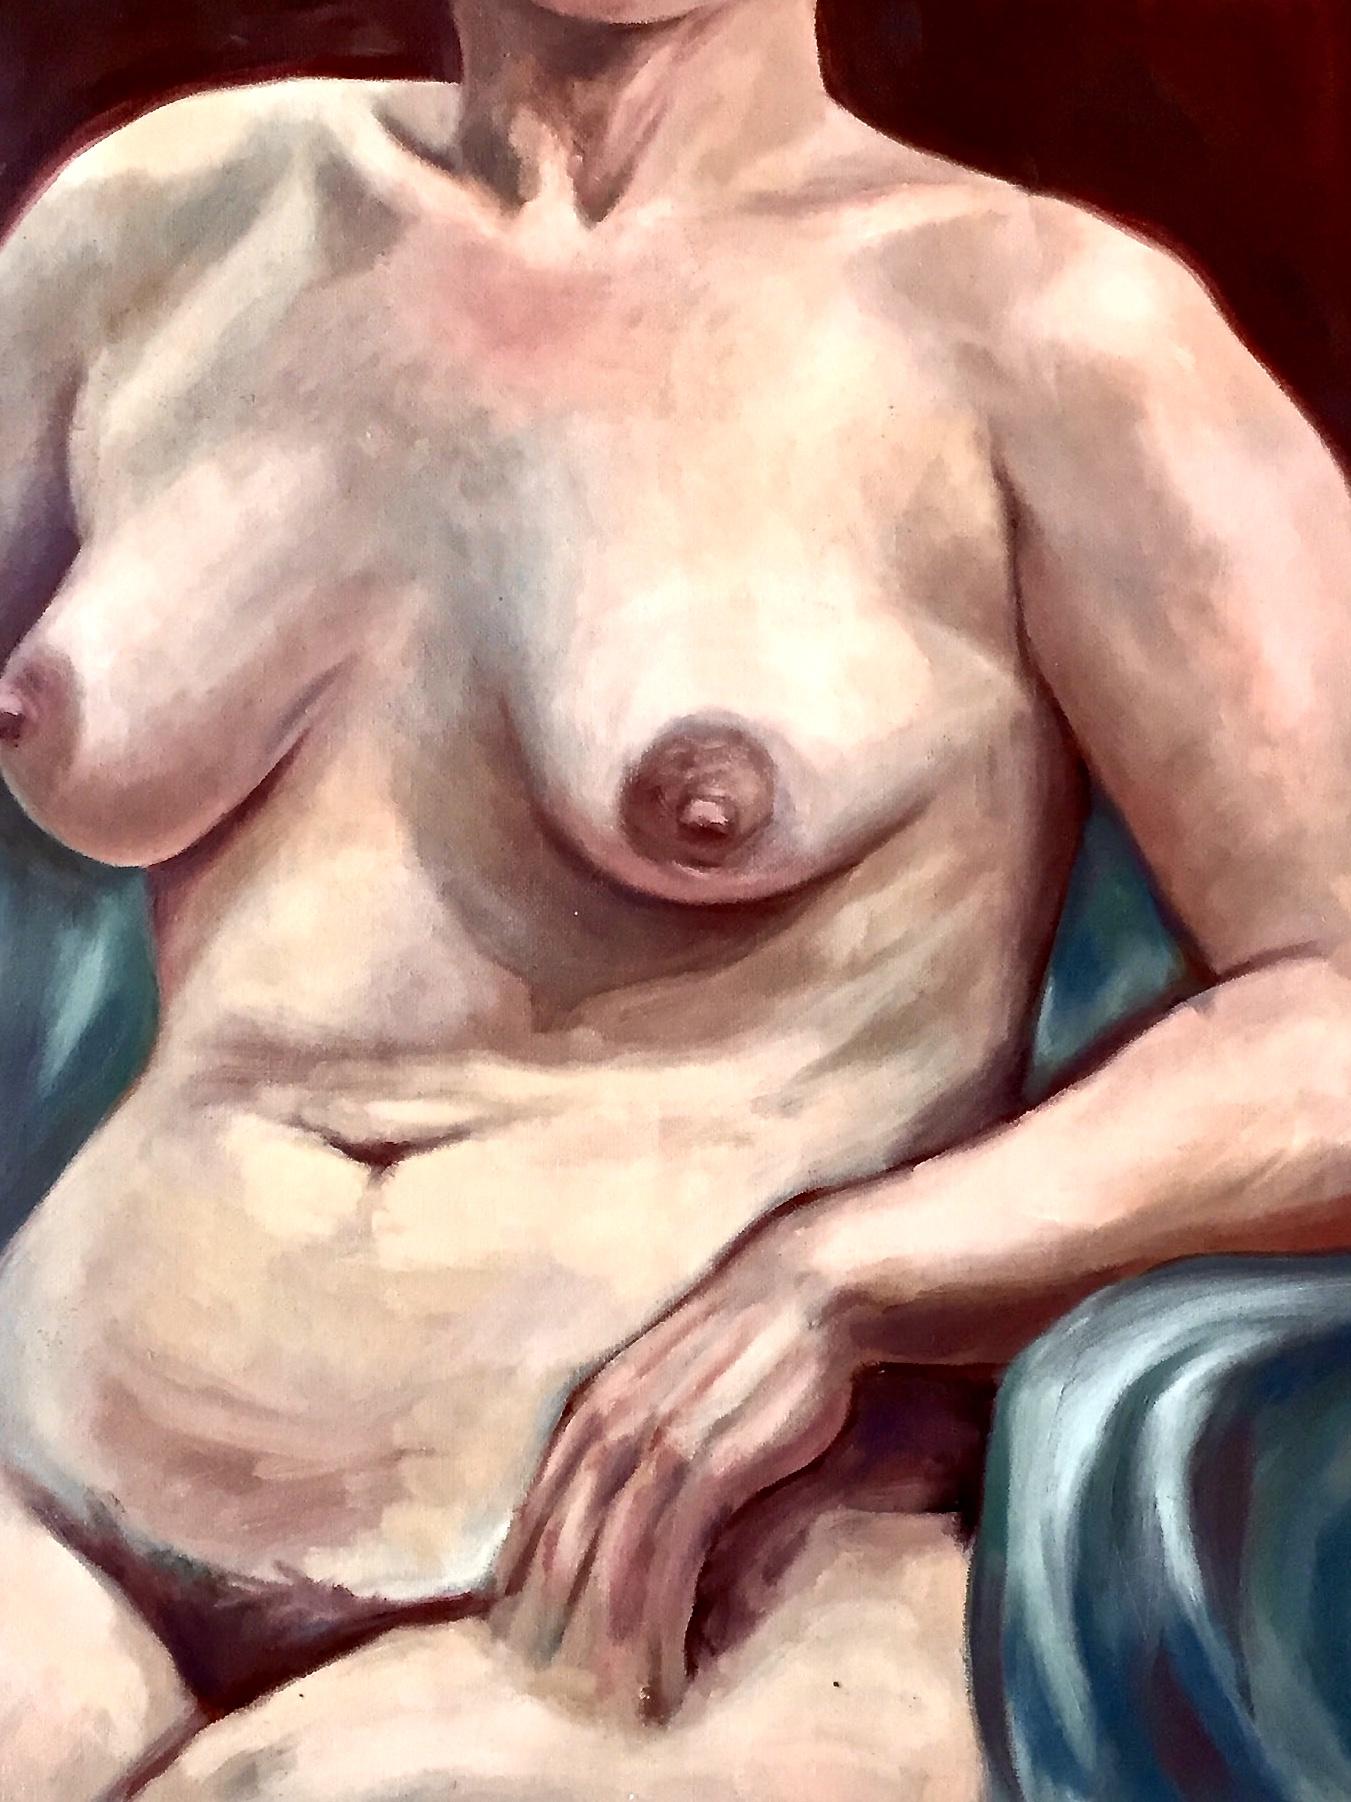 Vulnerable -  2001 oil on canvas 38cm x 51cm